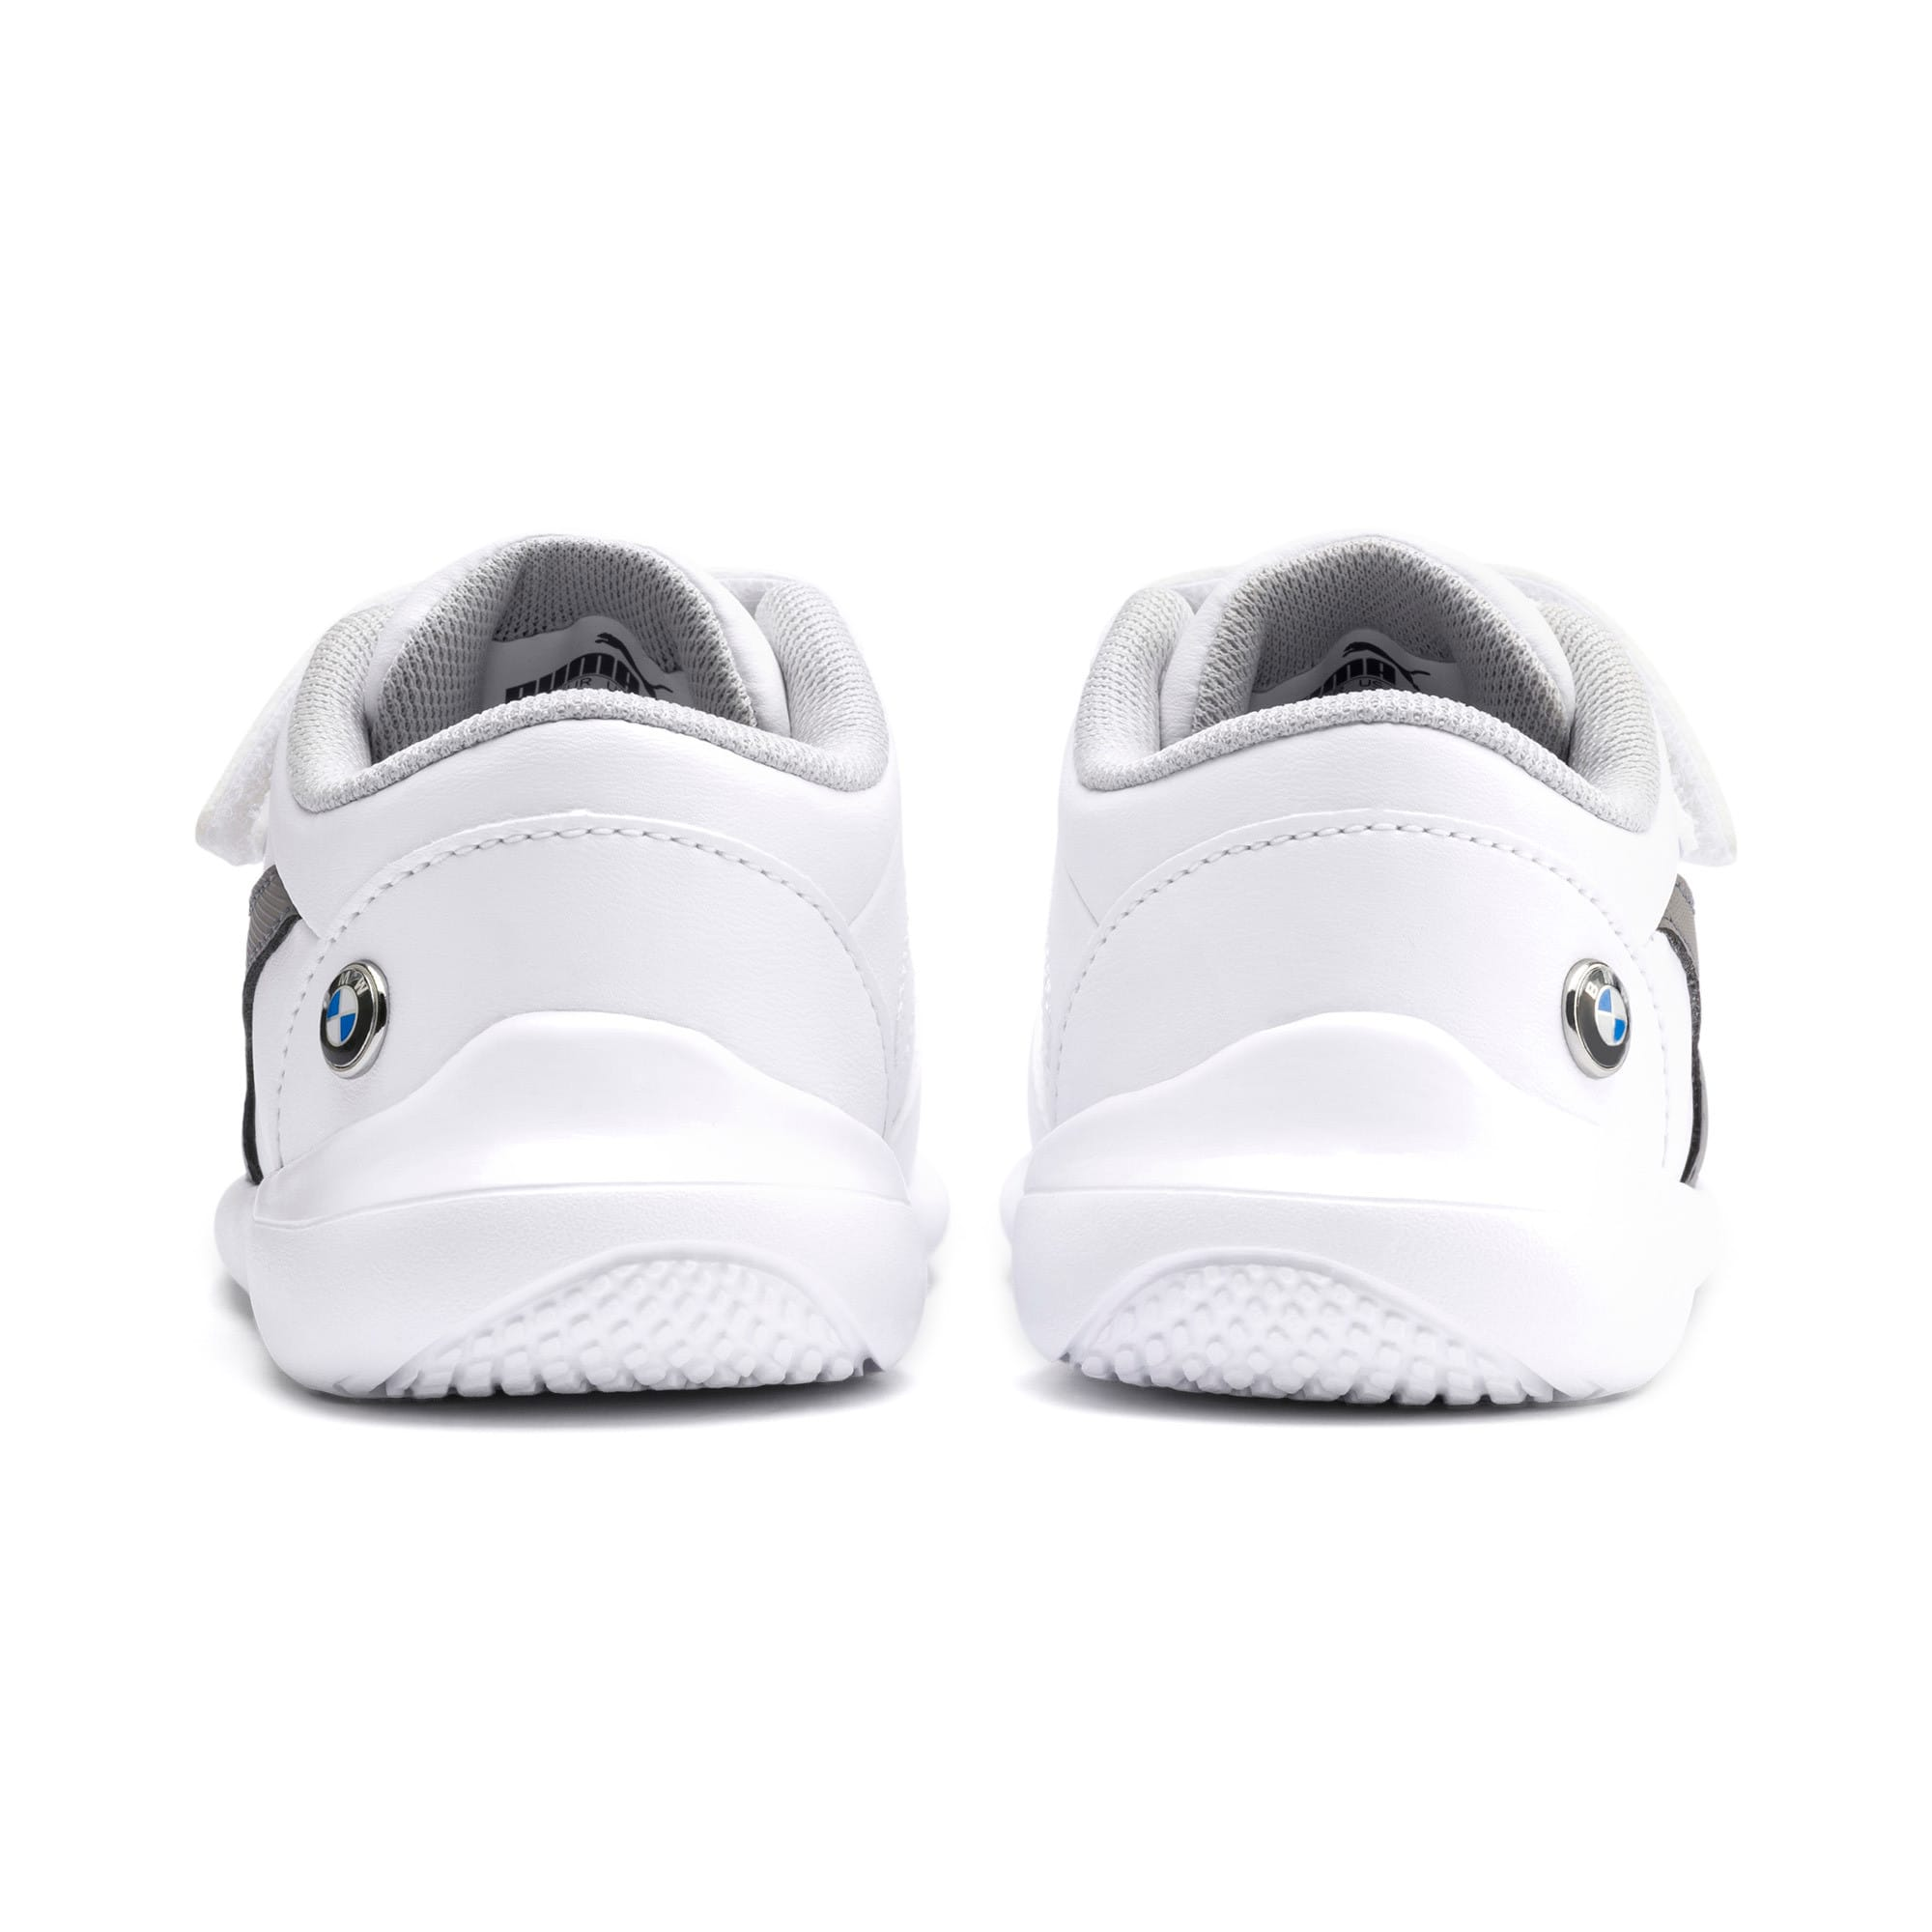 Miniatura 3 de ZapatosBMW MMotorsportKart Cat III para bebé, Puma White-Smoked Pearl, mediano